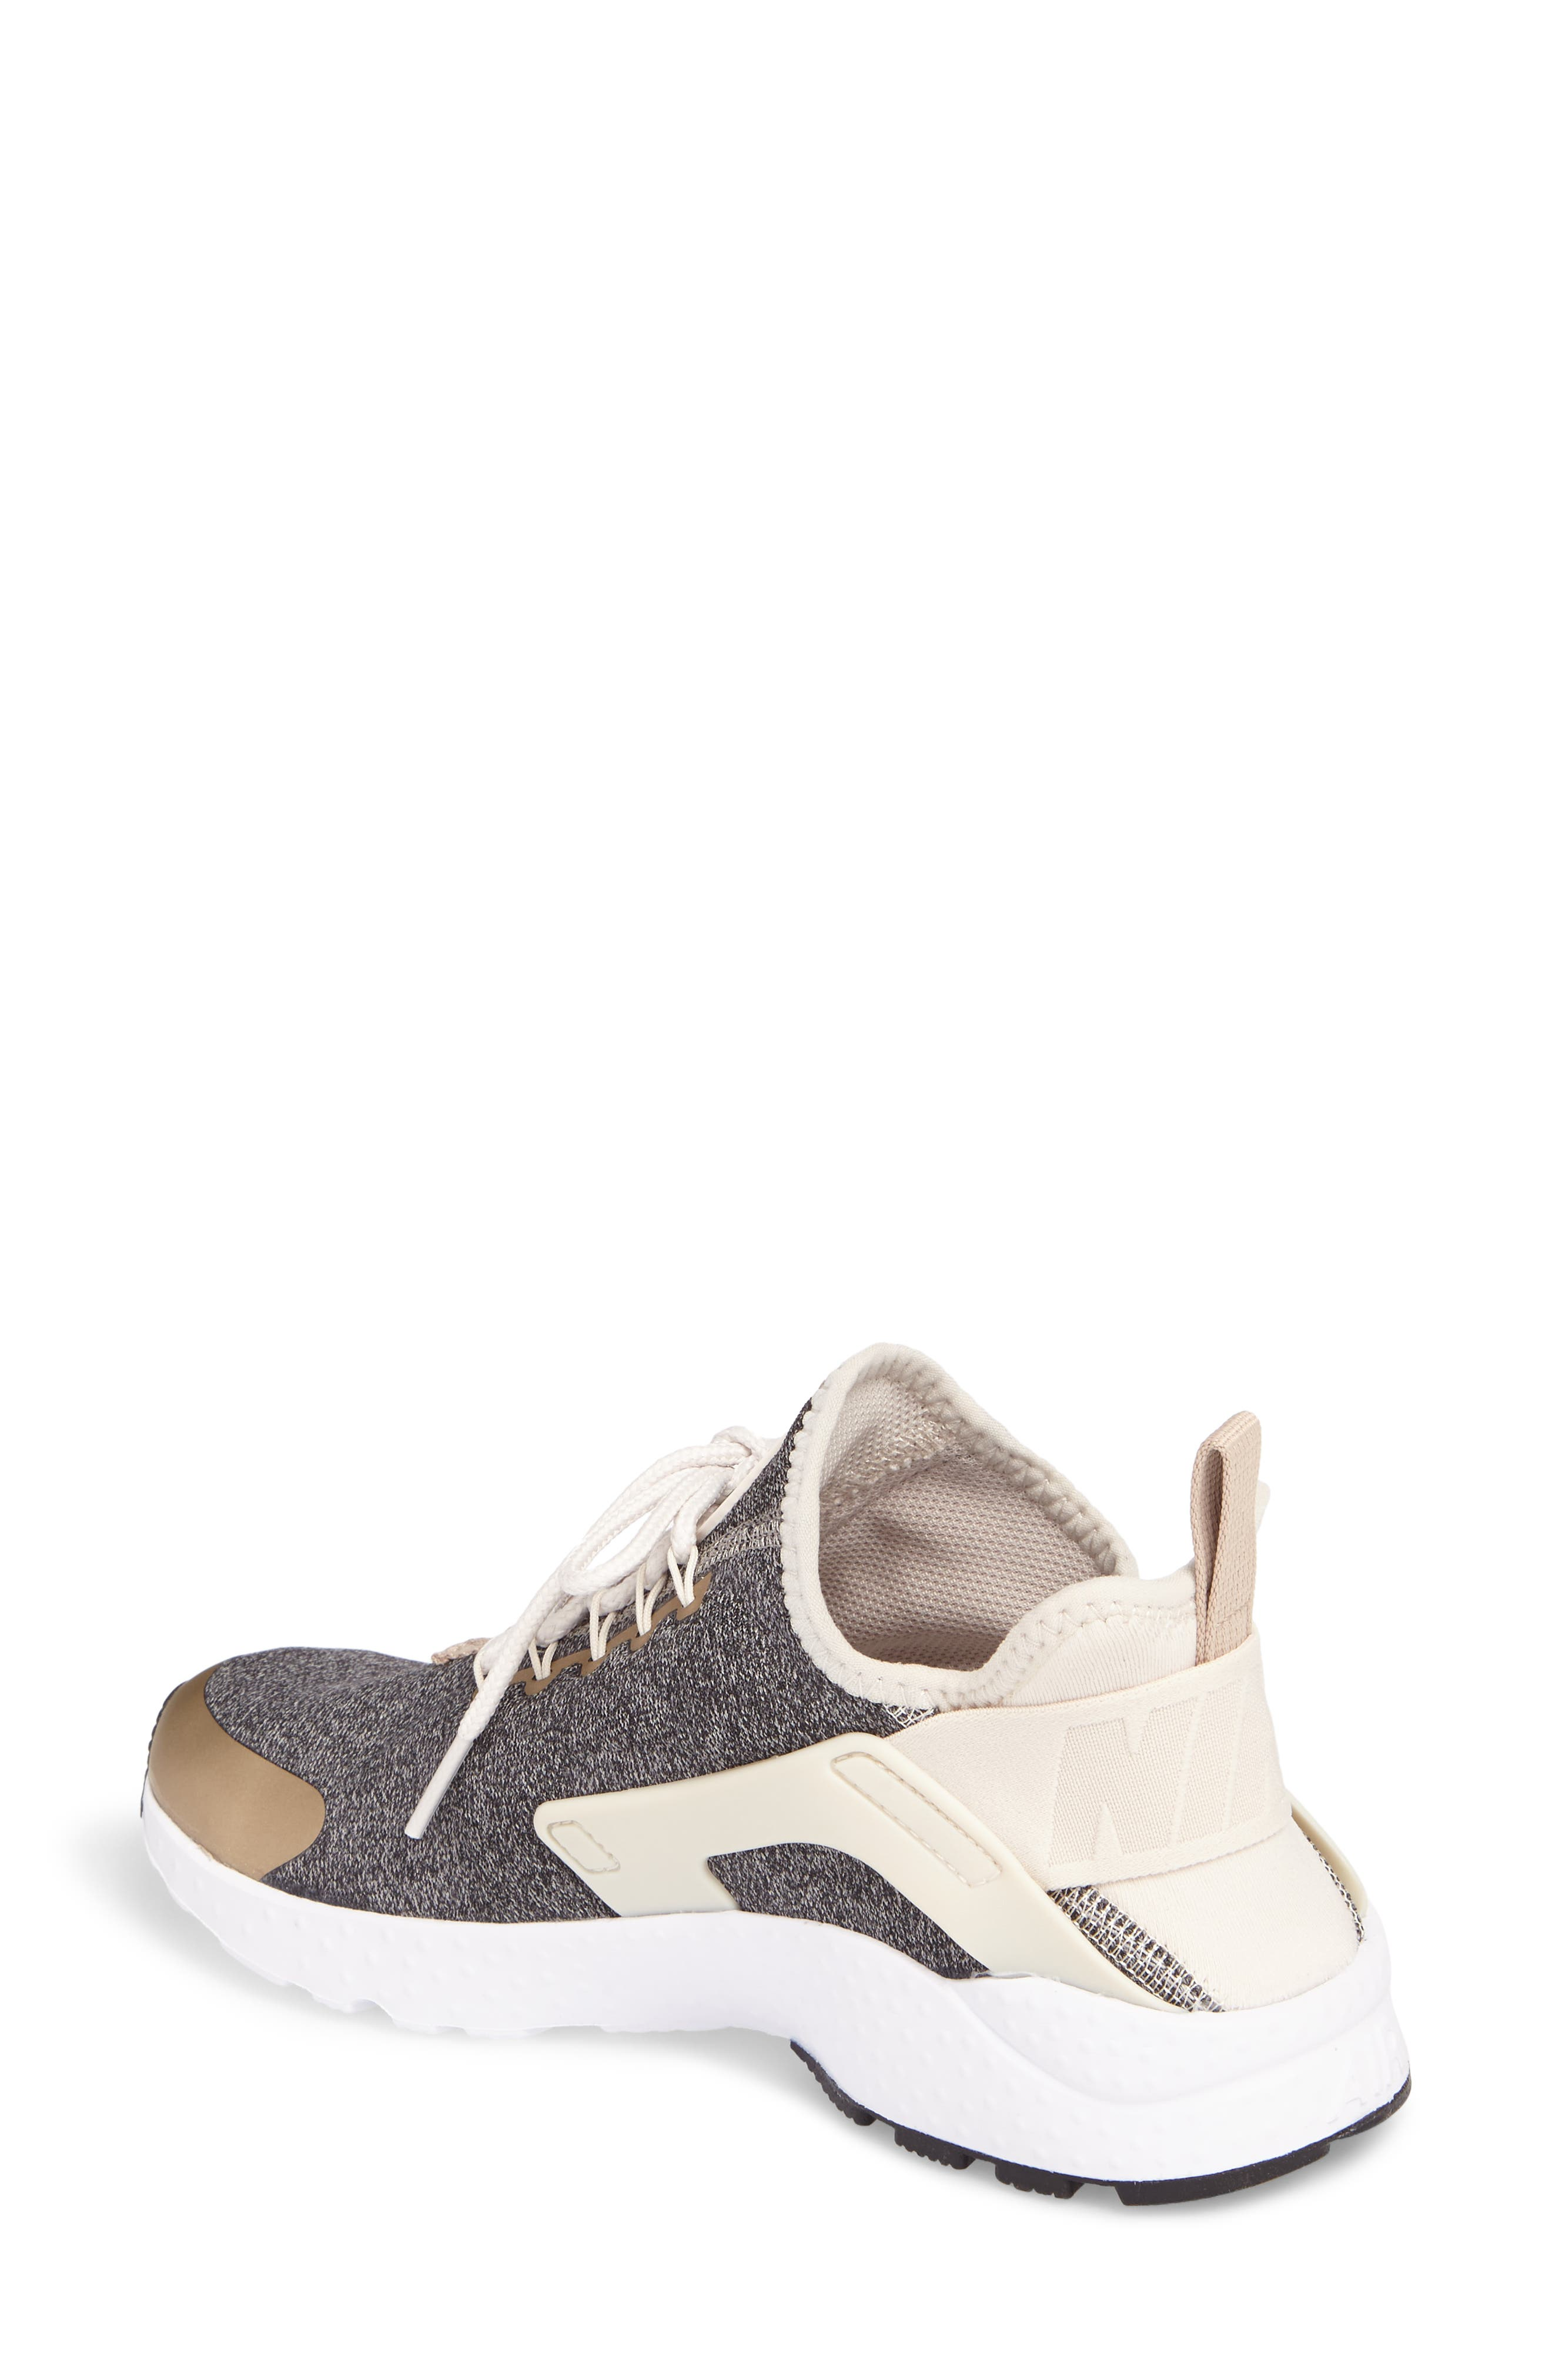 'Air Huarache Run Ultra SE' Sneaker,                             Alternate thumbnail 2, color,                             285